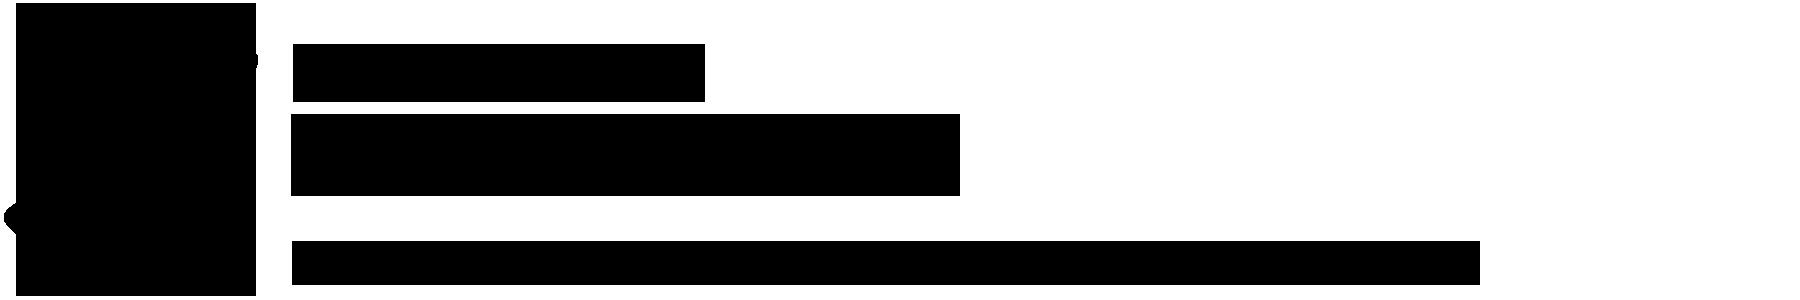 Philadelphia Department of Public Health Logo